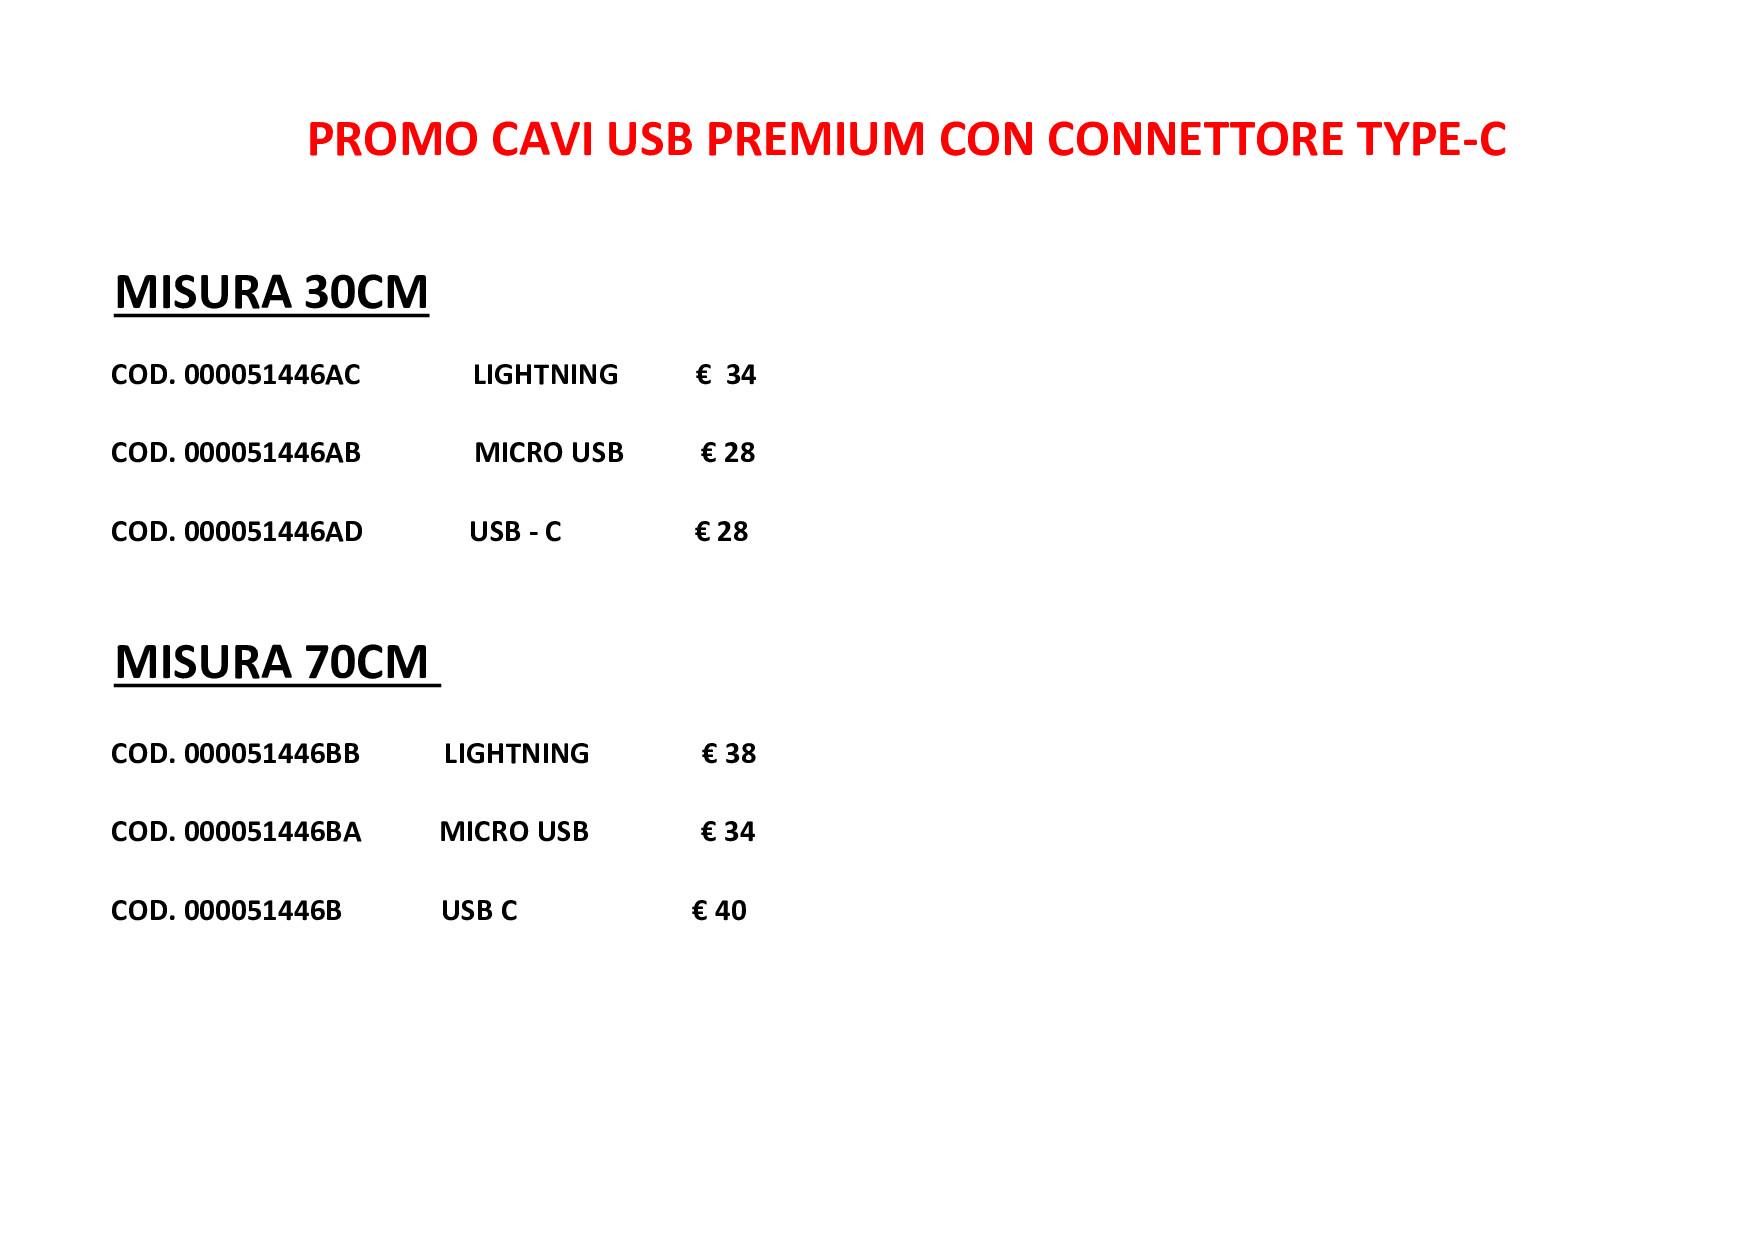 PROMOZIONE CAVI USB PREMIUM